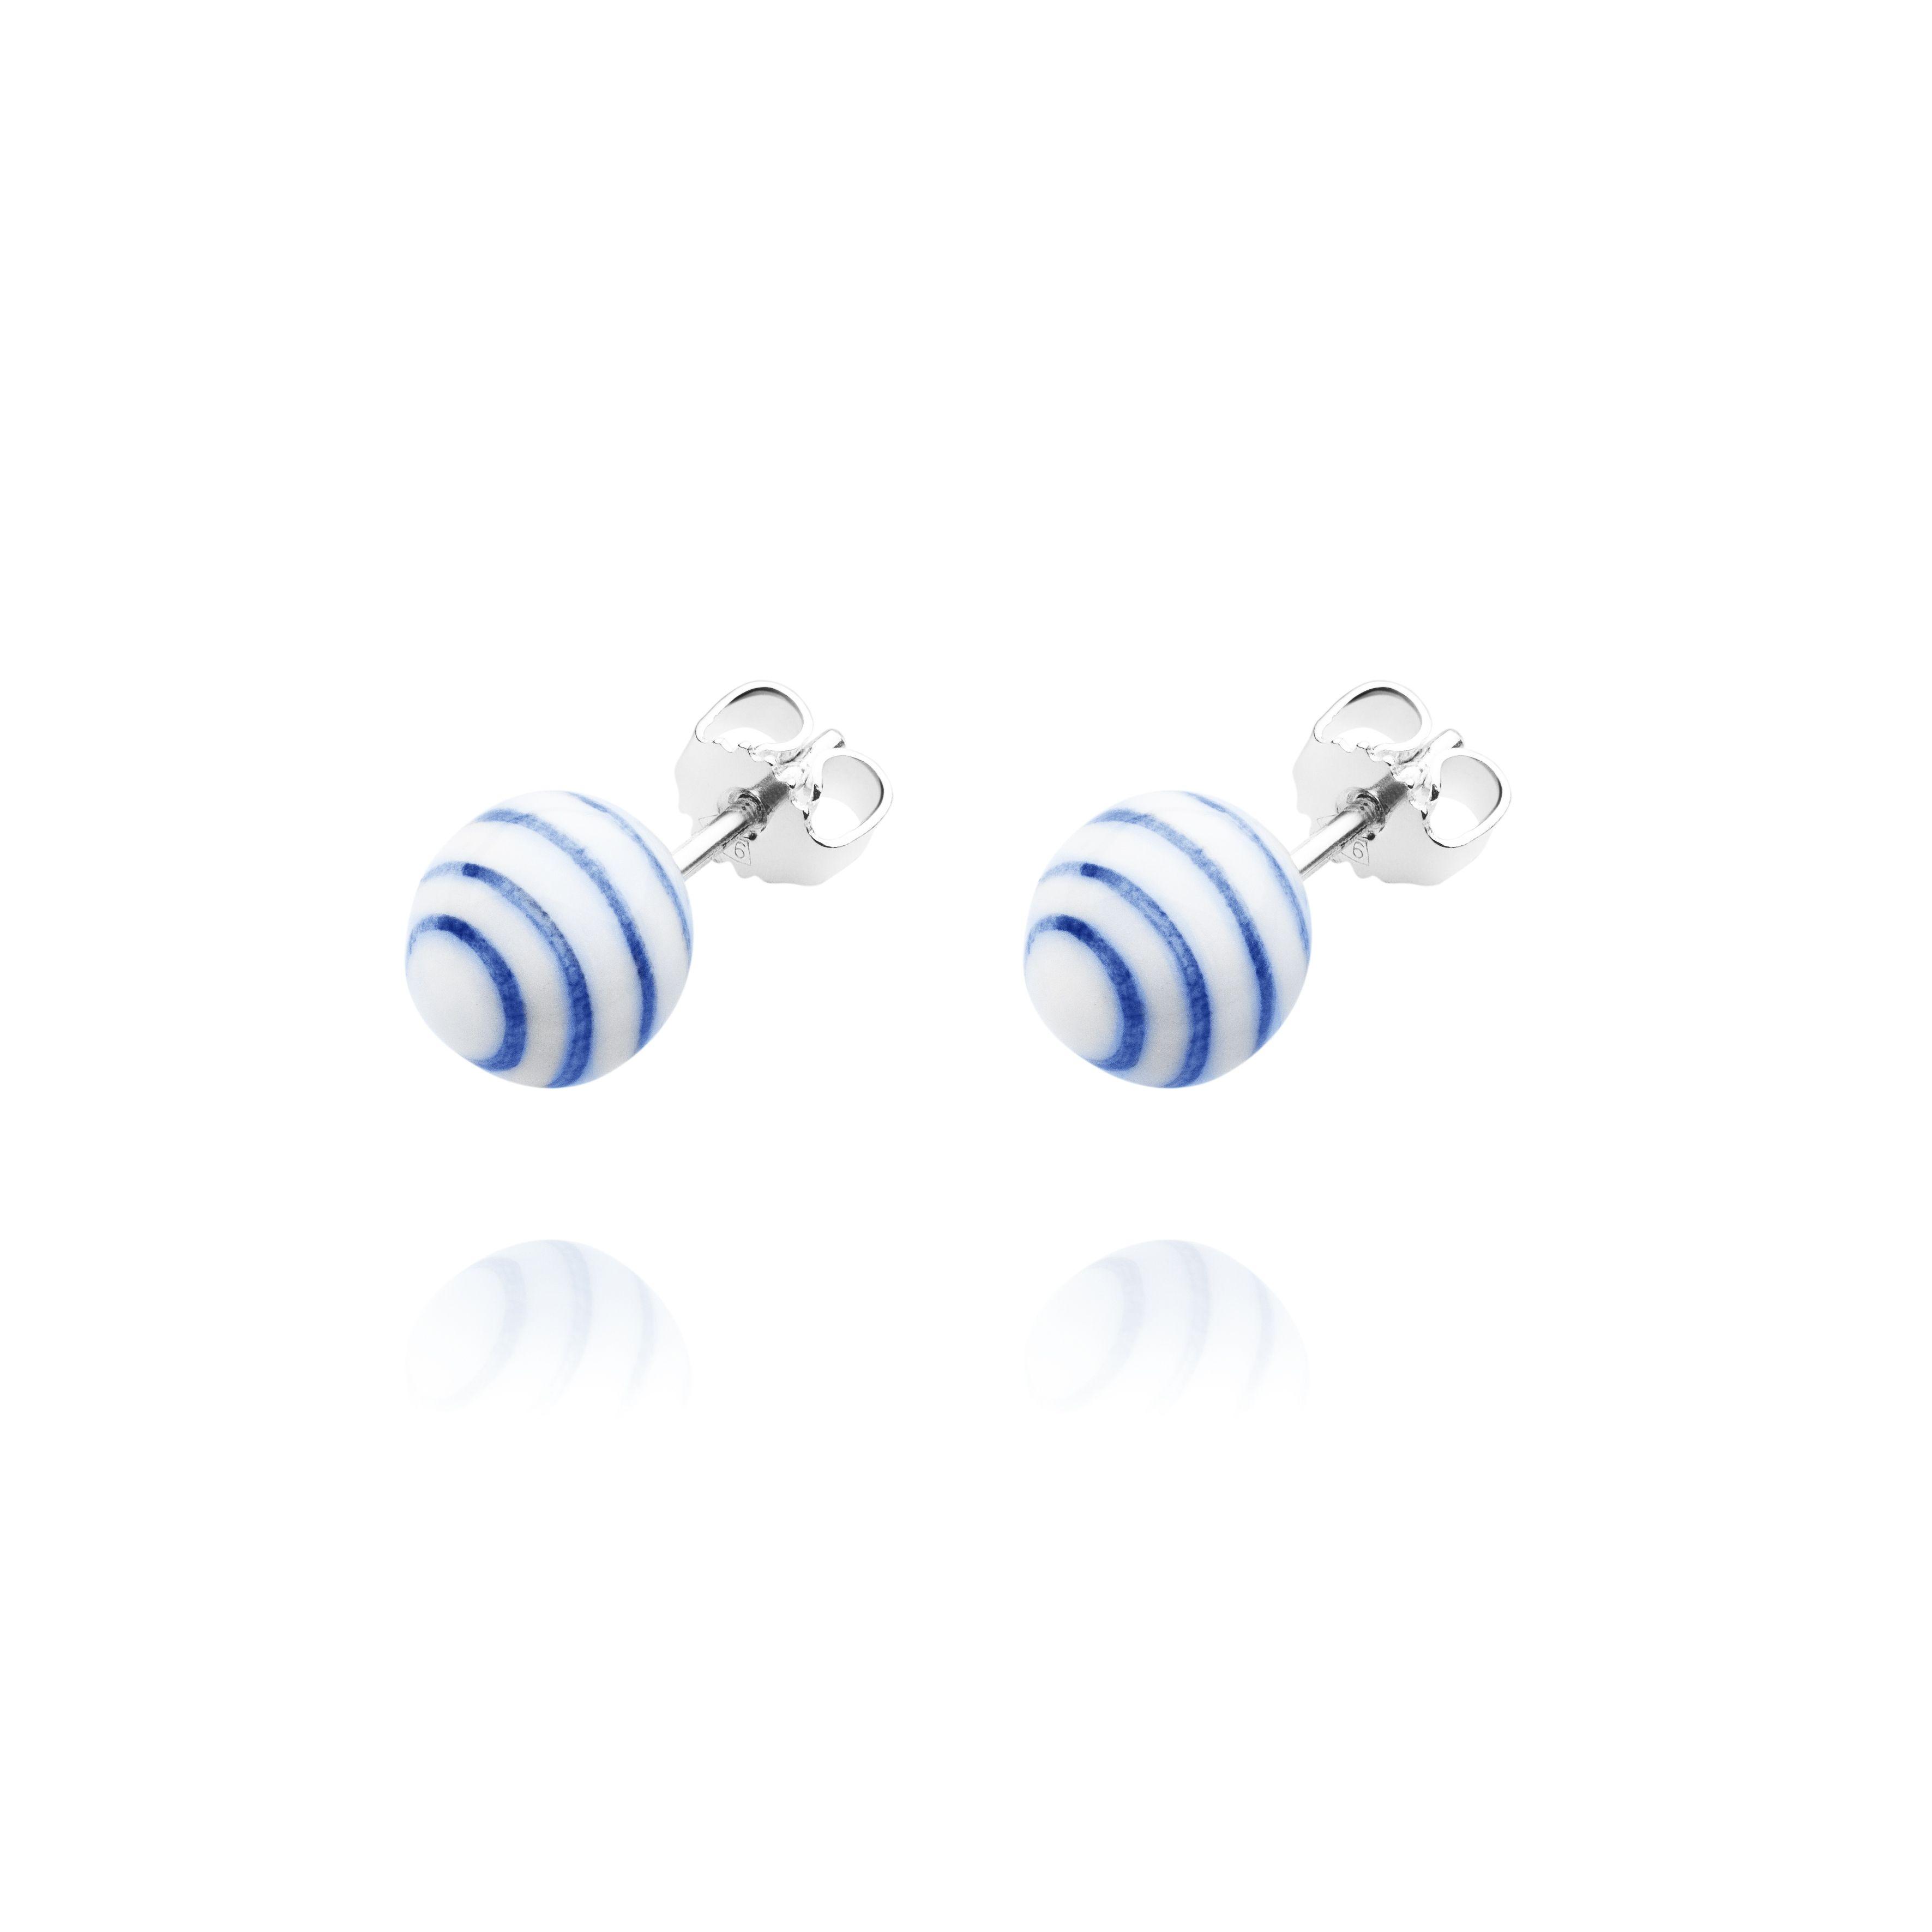 Smukke ørestikker fra Anne Black. Anne Black Stripes ørestikker er i hvid porcelæn med håndmalet blå striber - Tinga Tango Designbutik #stripes #ørestikker #earrings